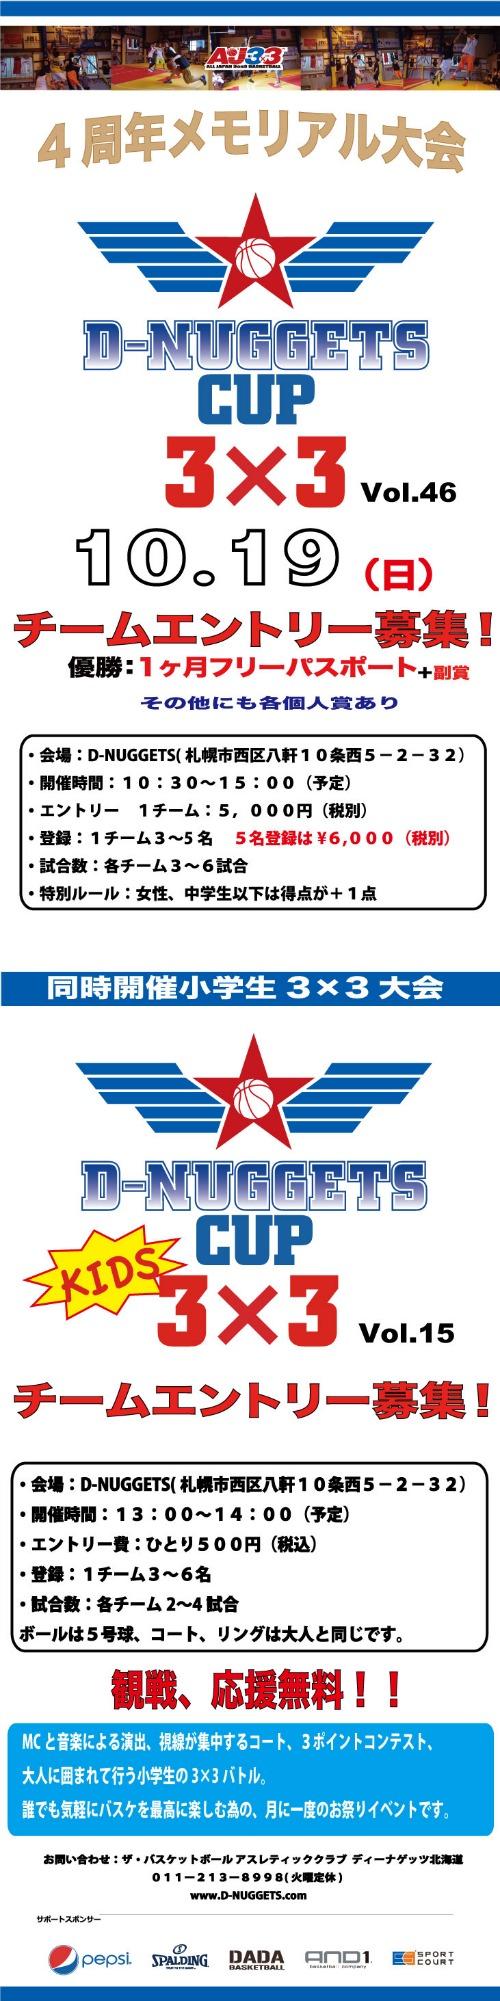 D-NUGGETS-CUP-HOKKAIDO-Vol.46.jpg